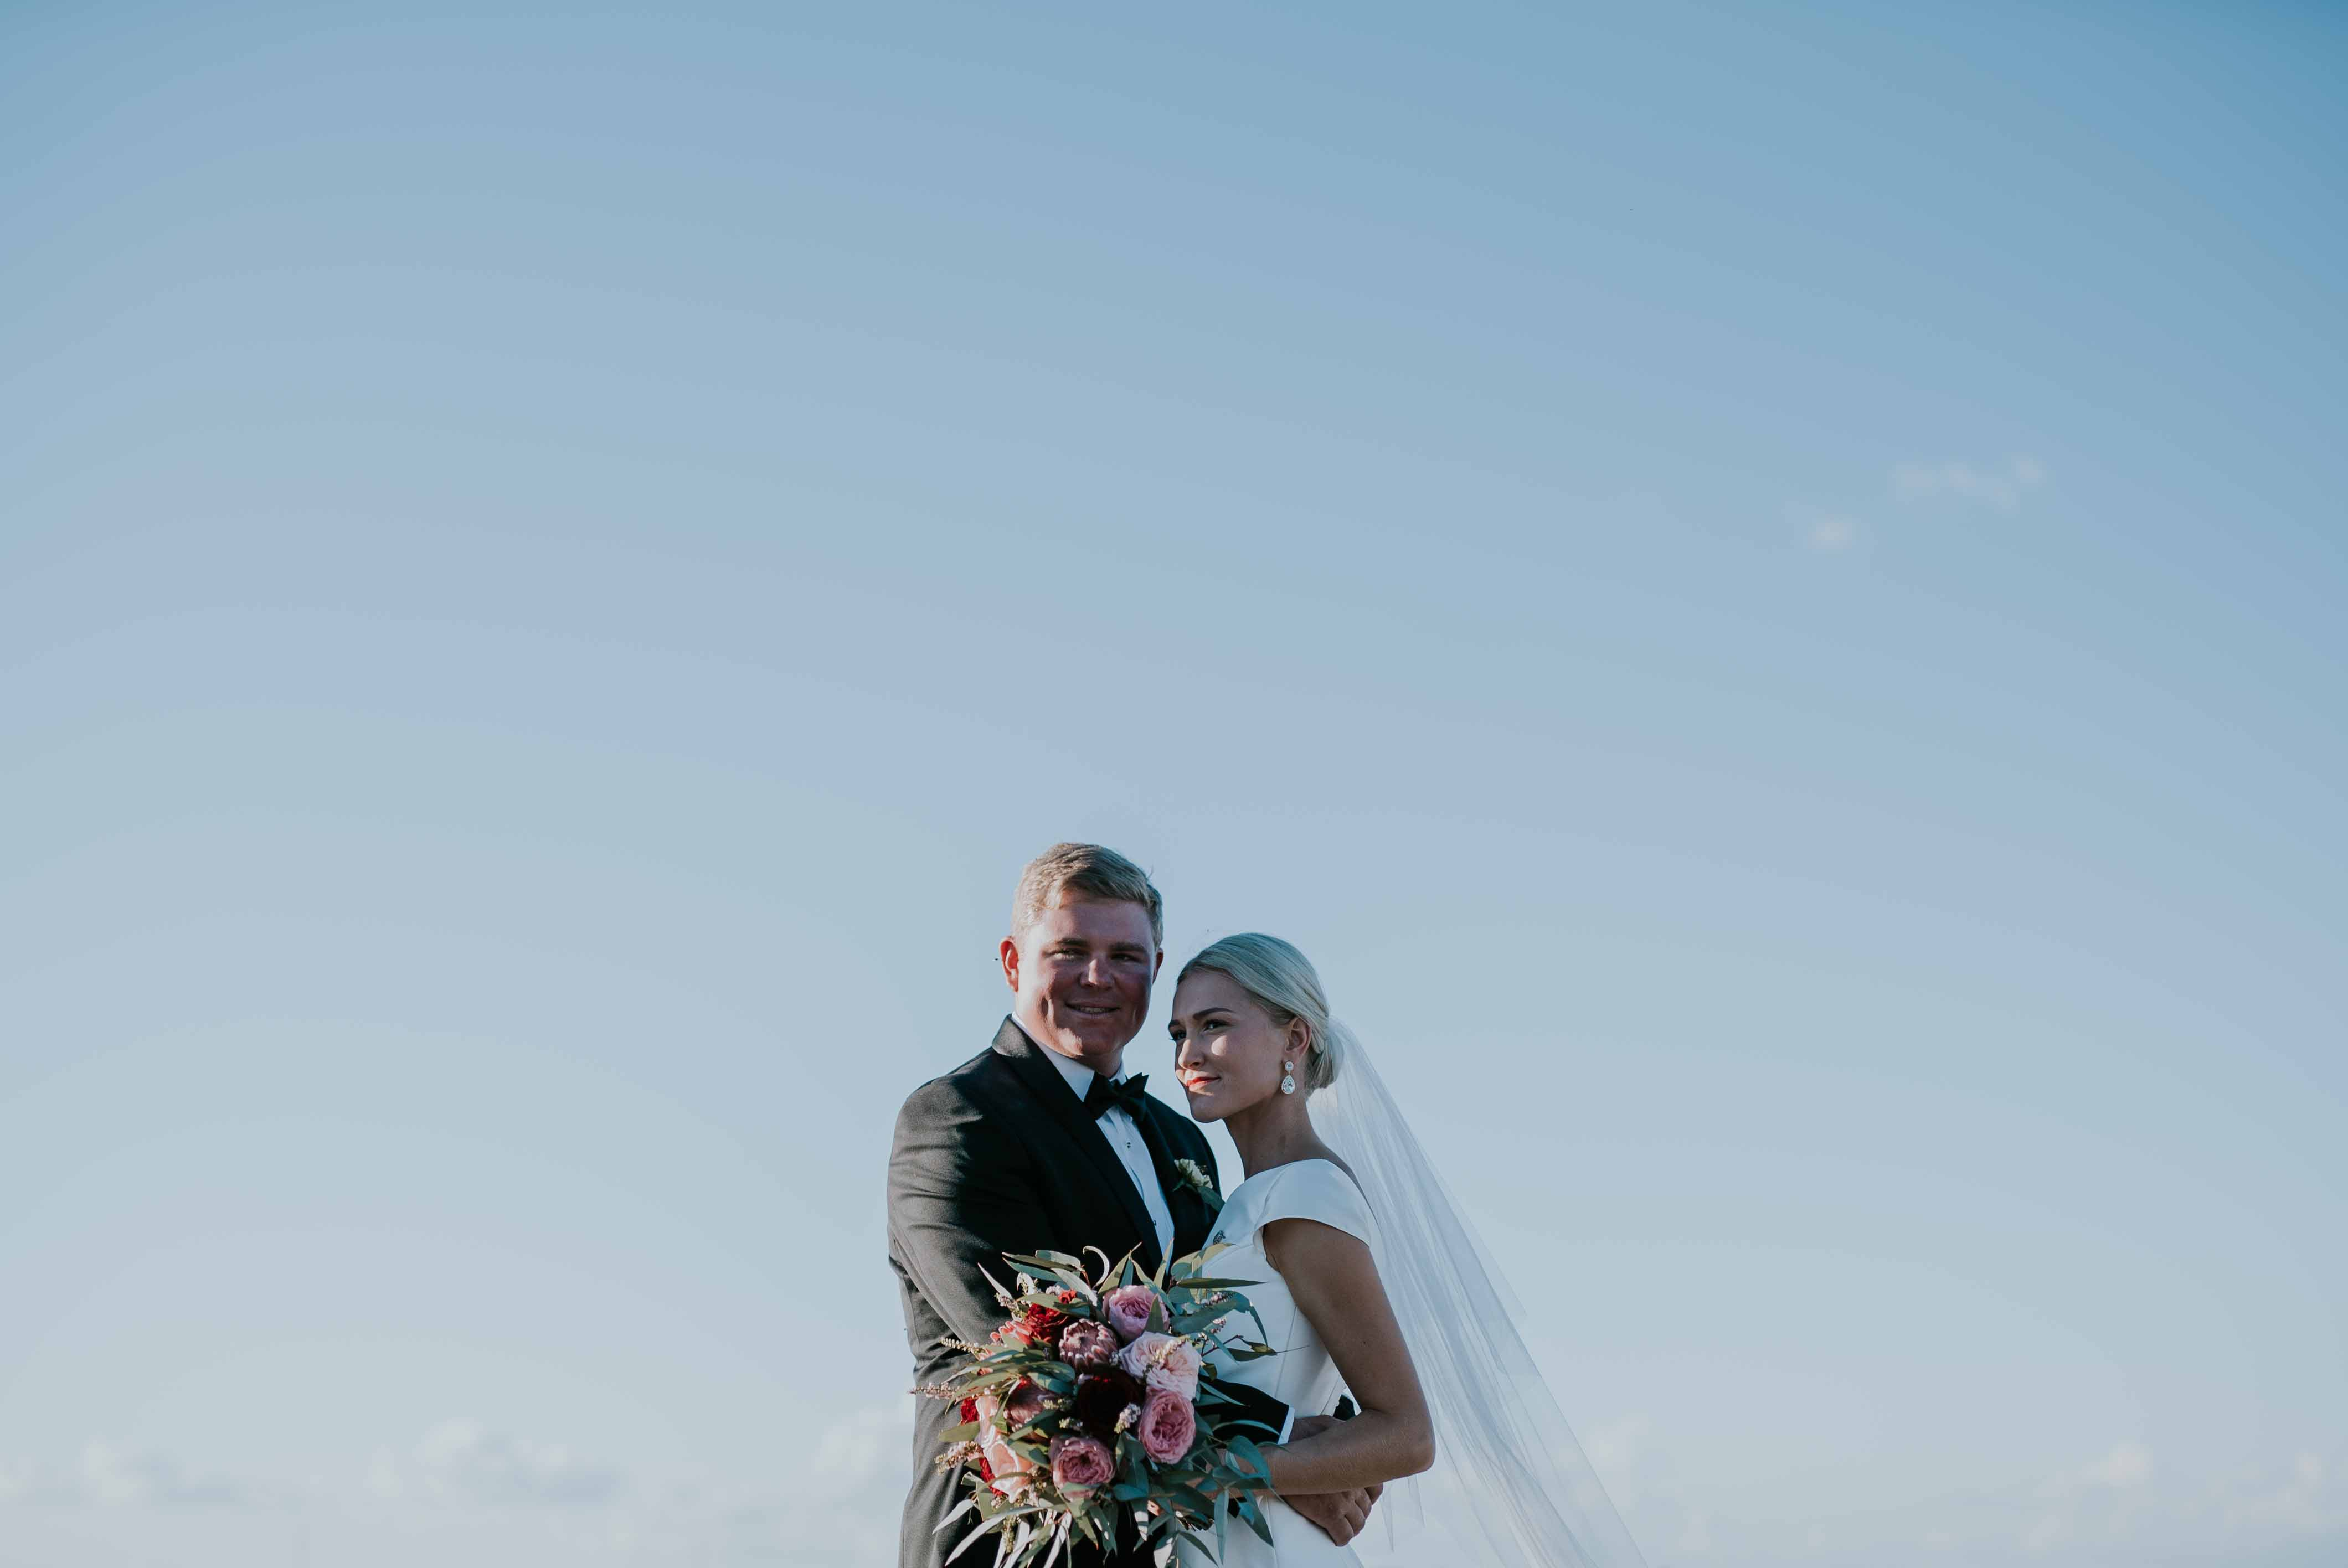 William + Kate | 18/03/2017 | Miles Wedding Video | Miles, QLD